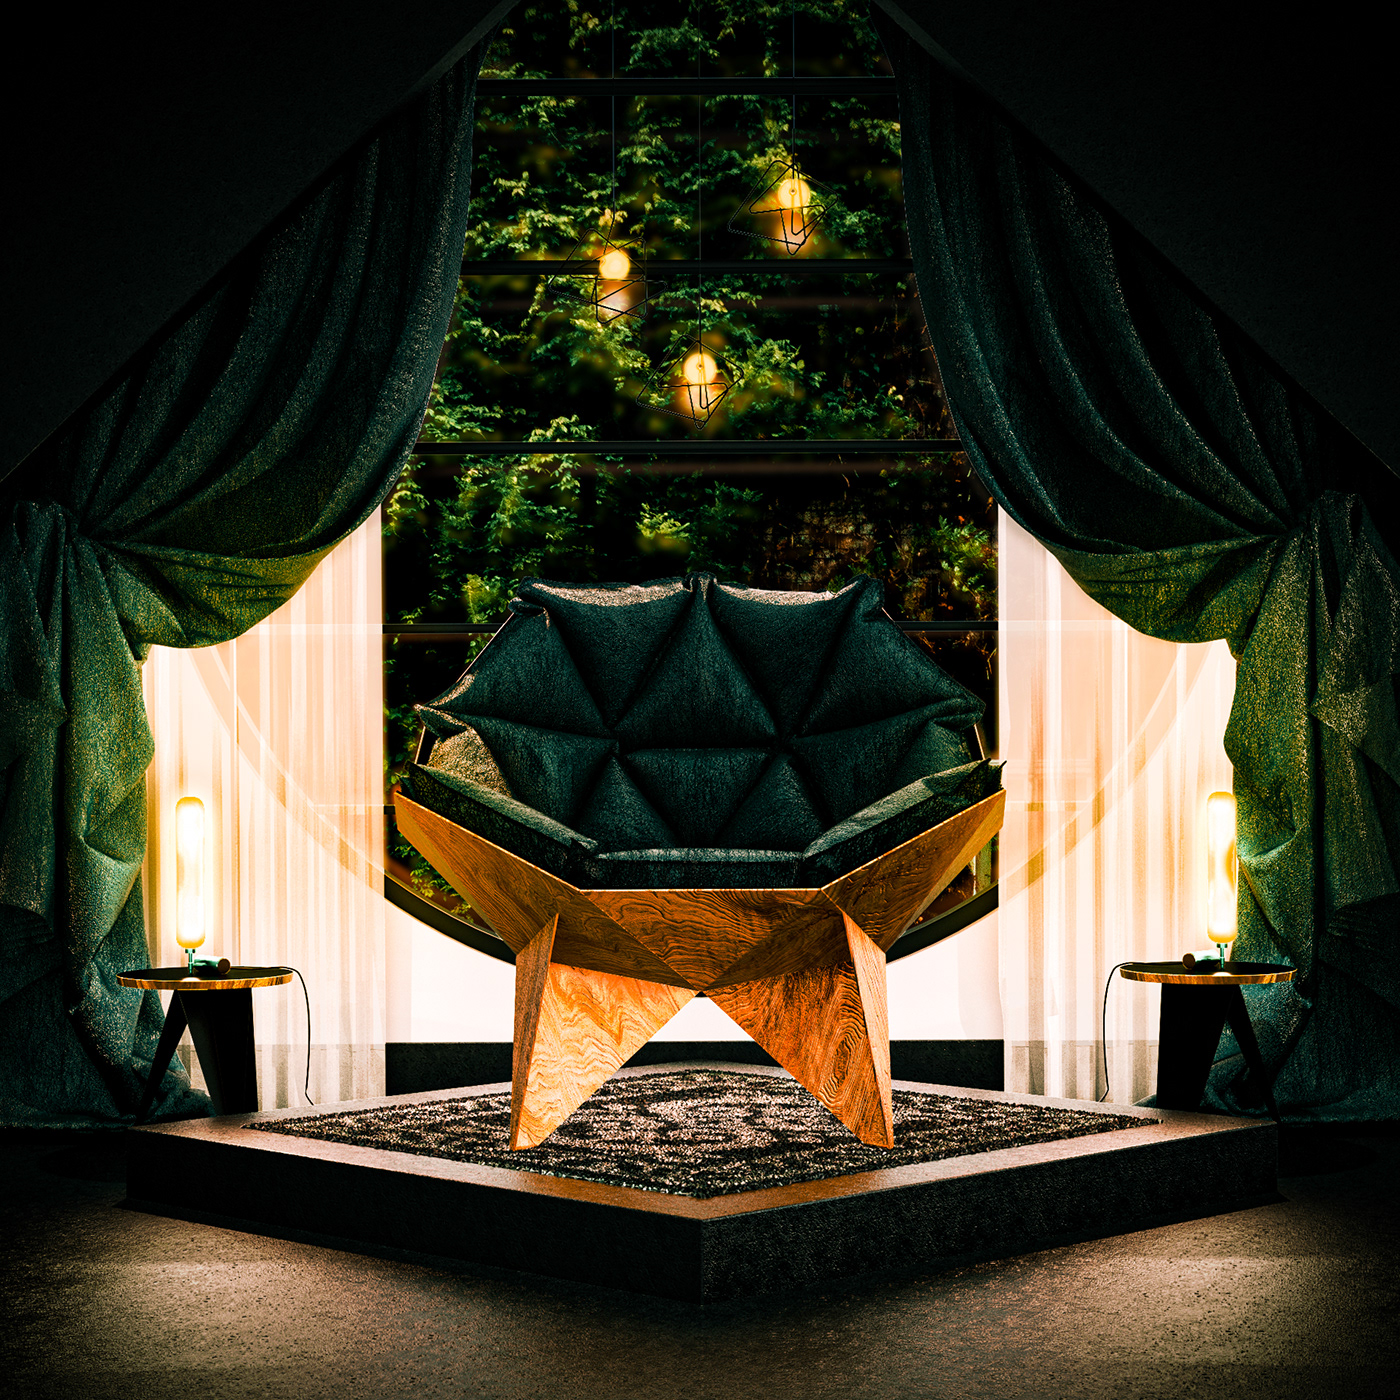 Modern Nature - Concept Interior Design for a Modern Home.